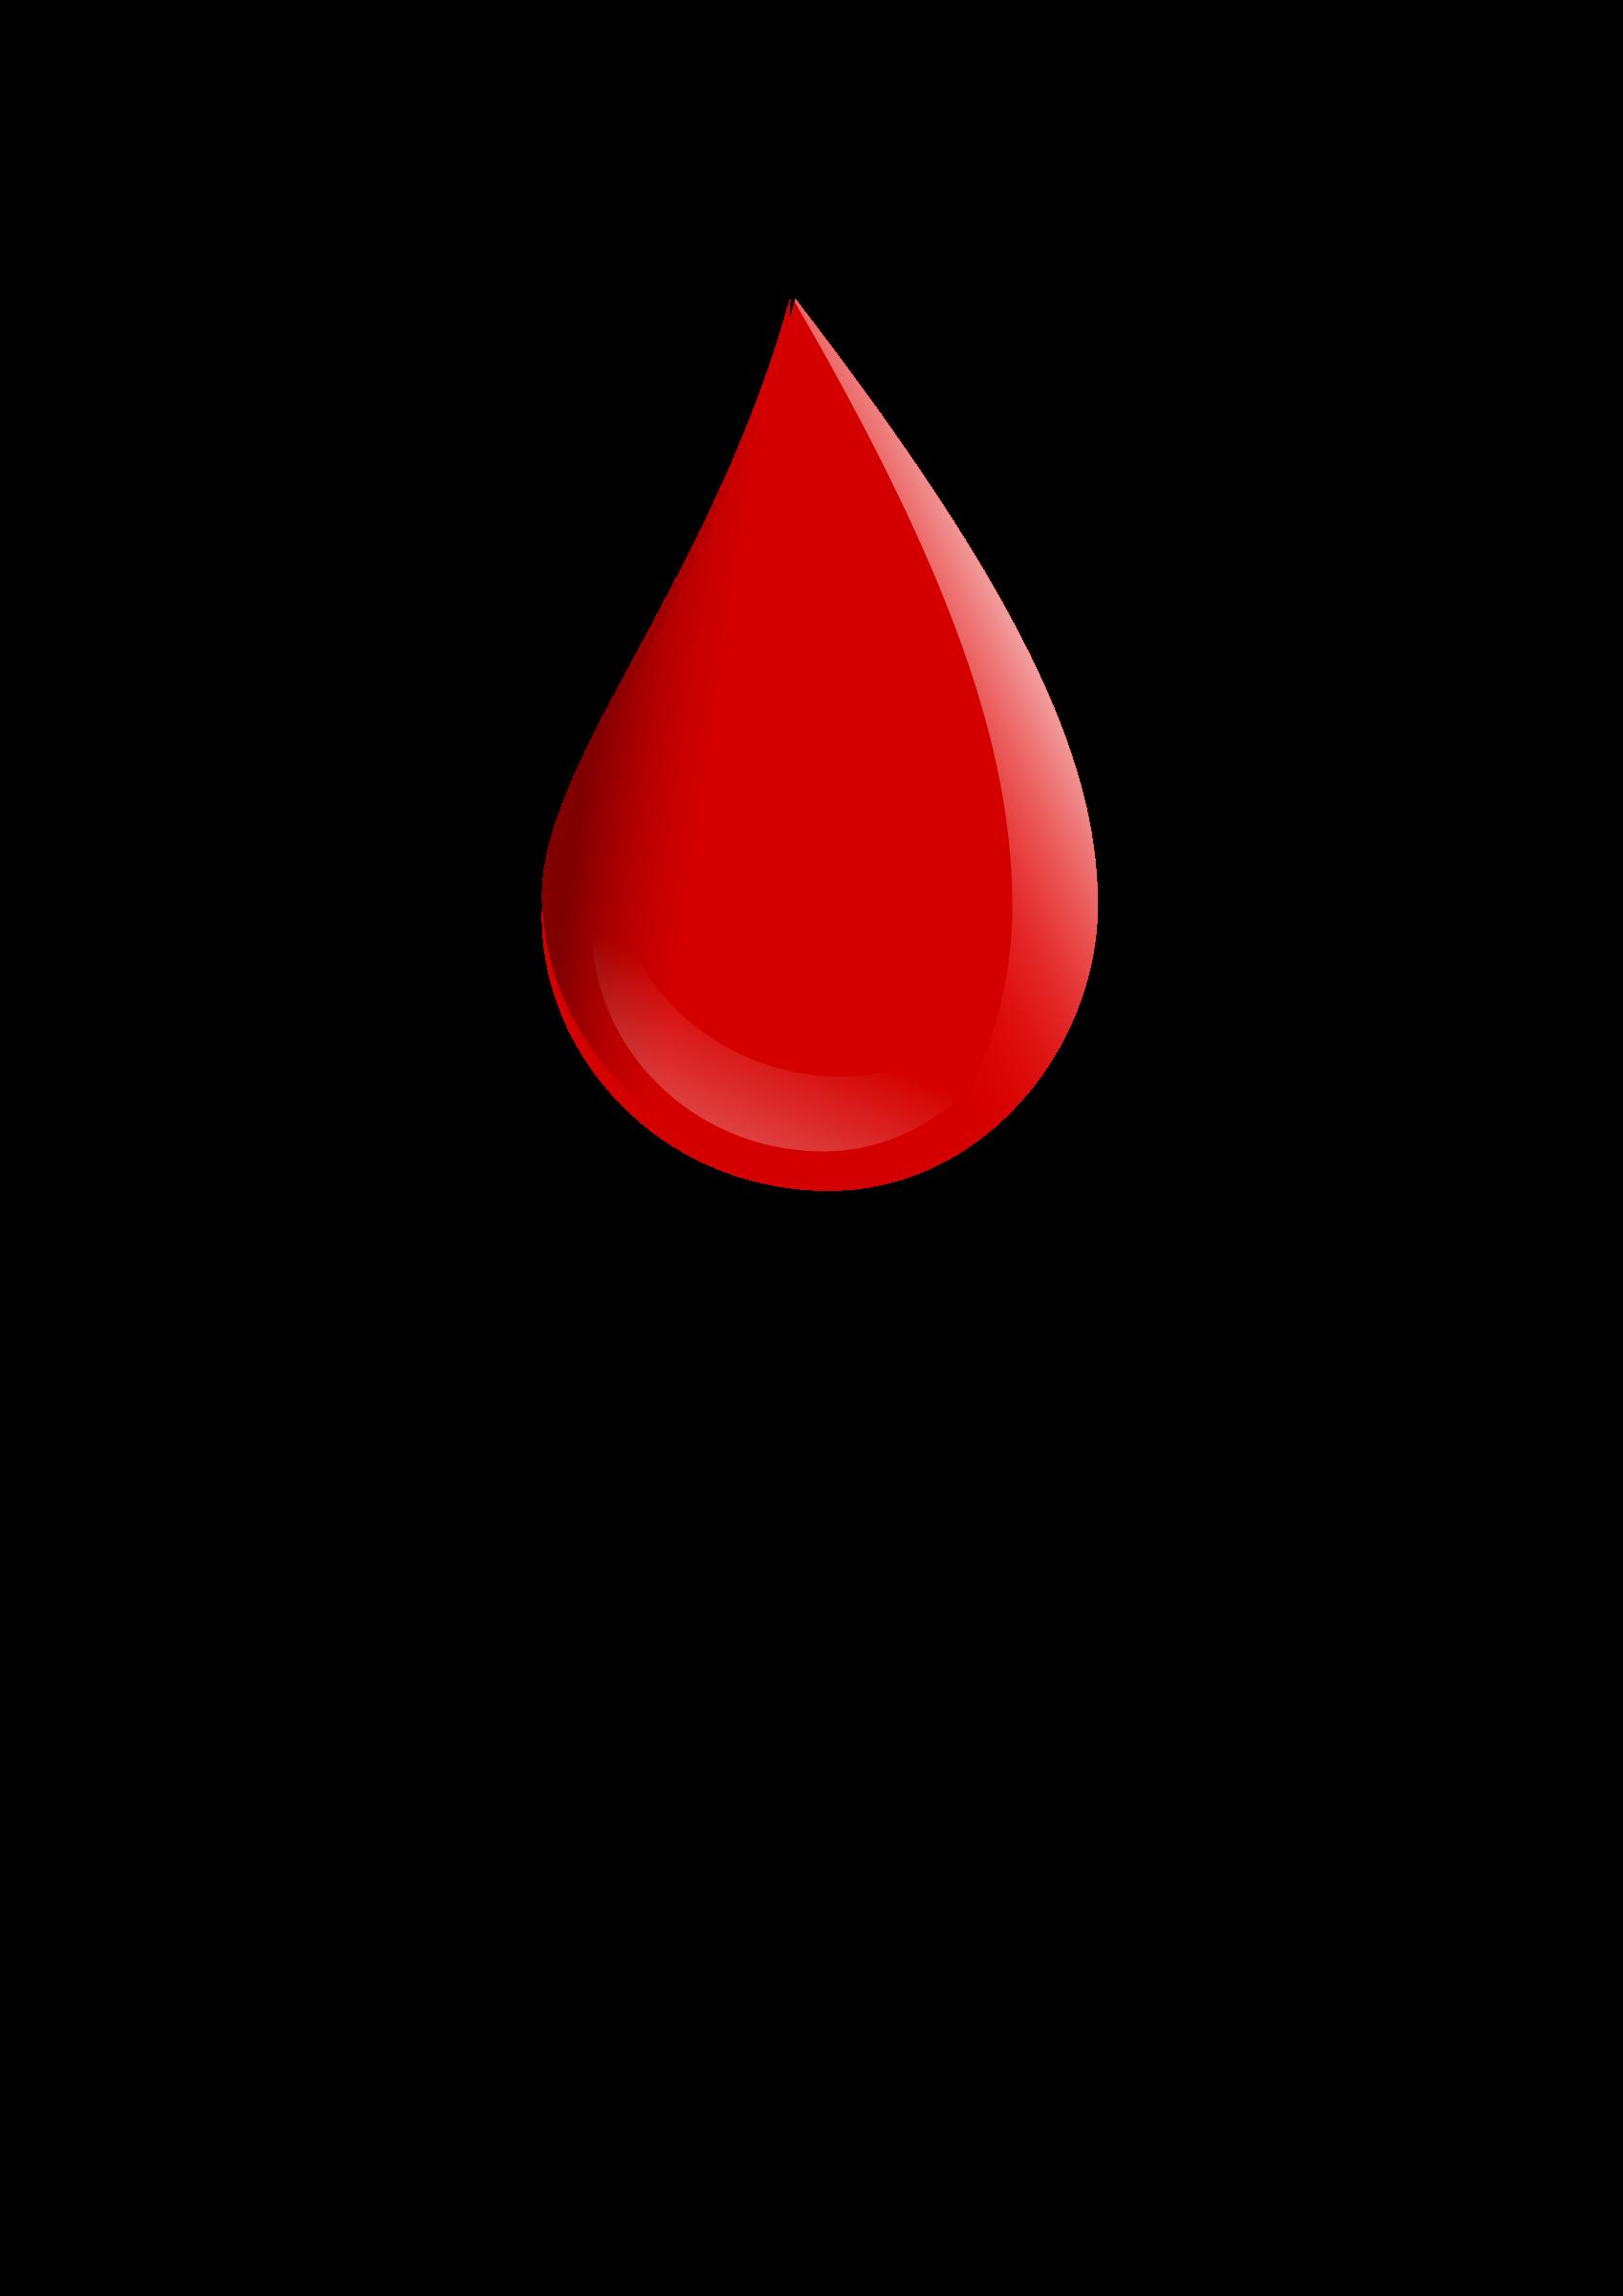 Blood drop by jazzfunman